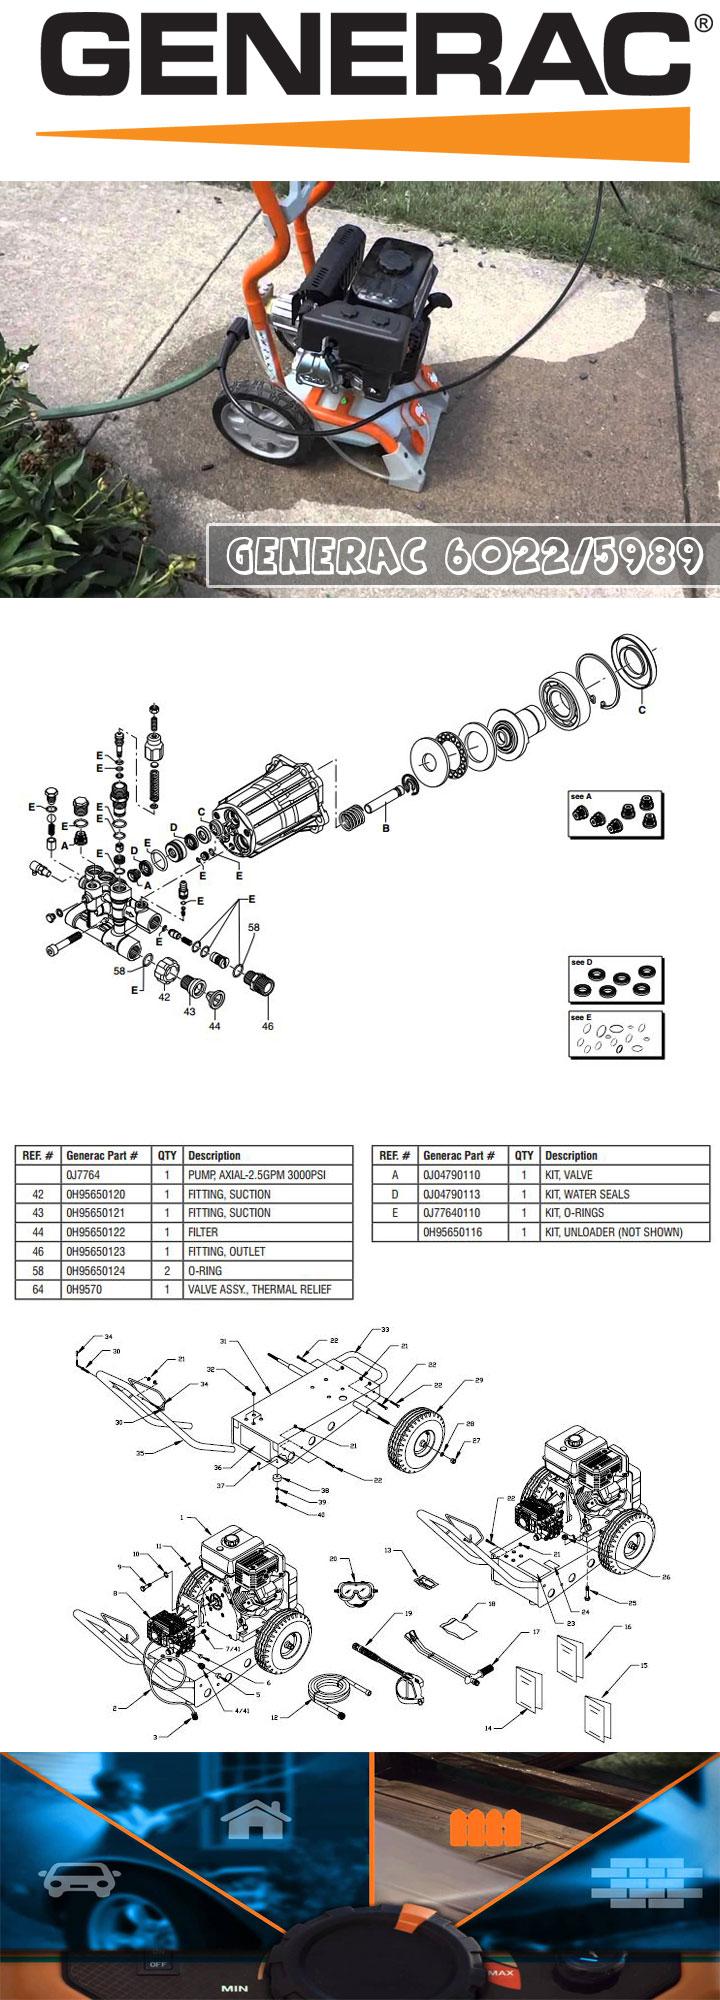 Generac 6022 - Infographic Best Pressure Washer Reviews